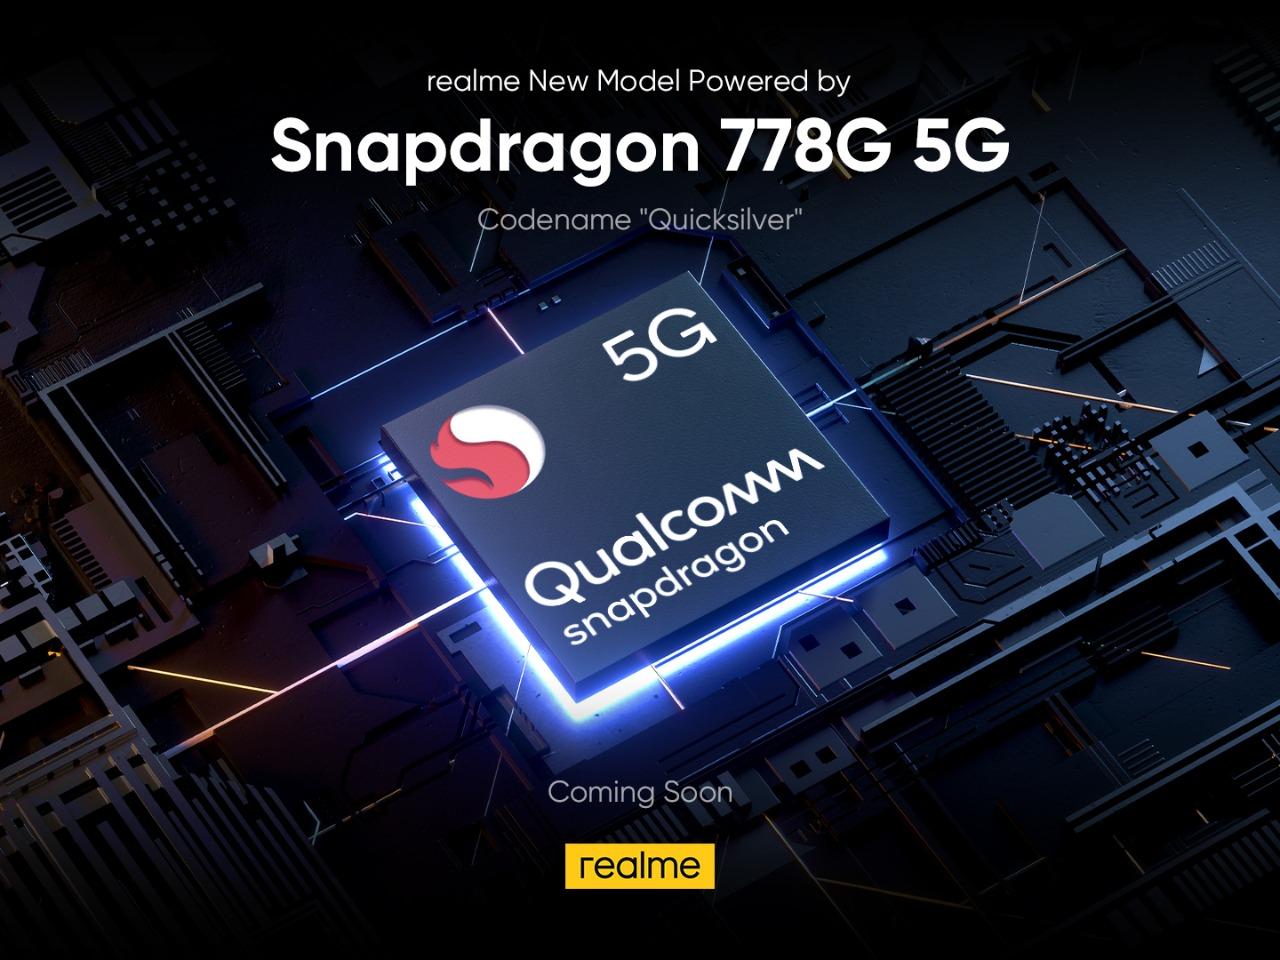 realme Snapdragon 778G